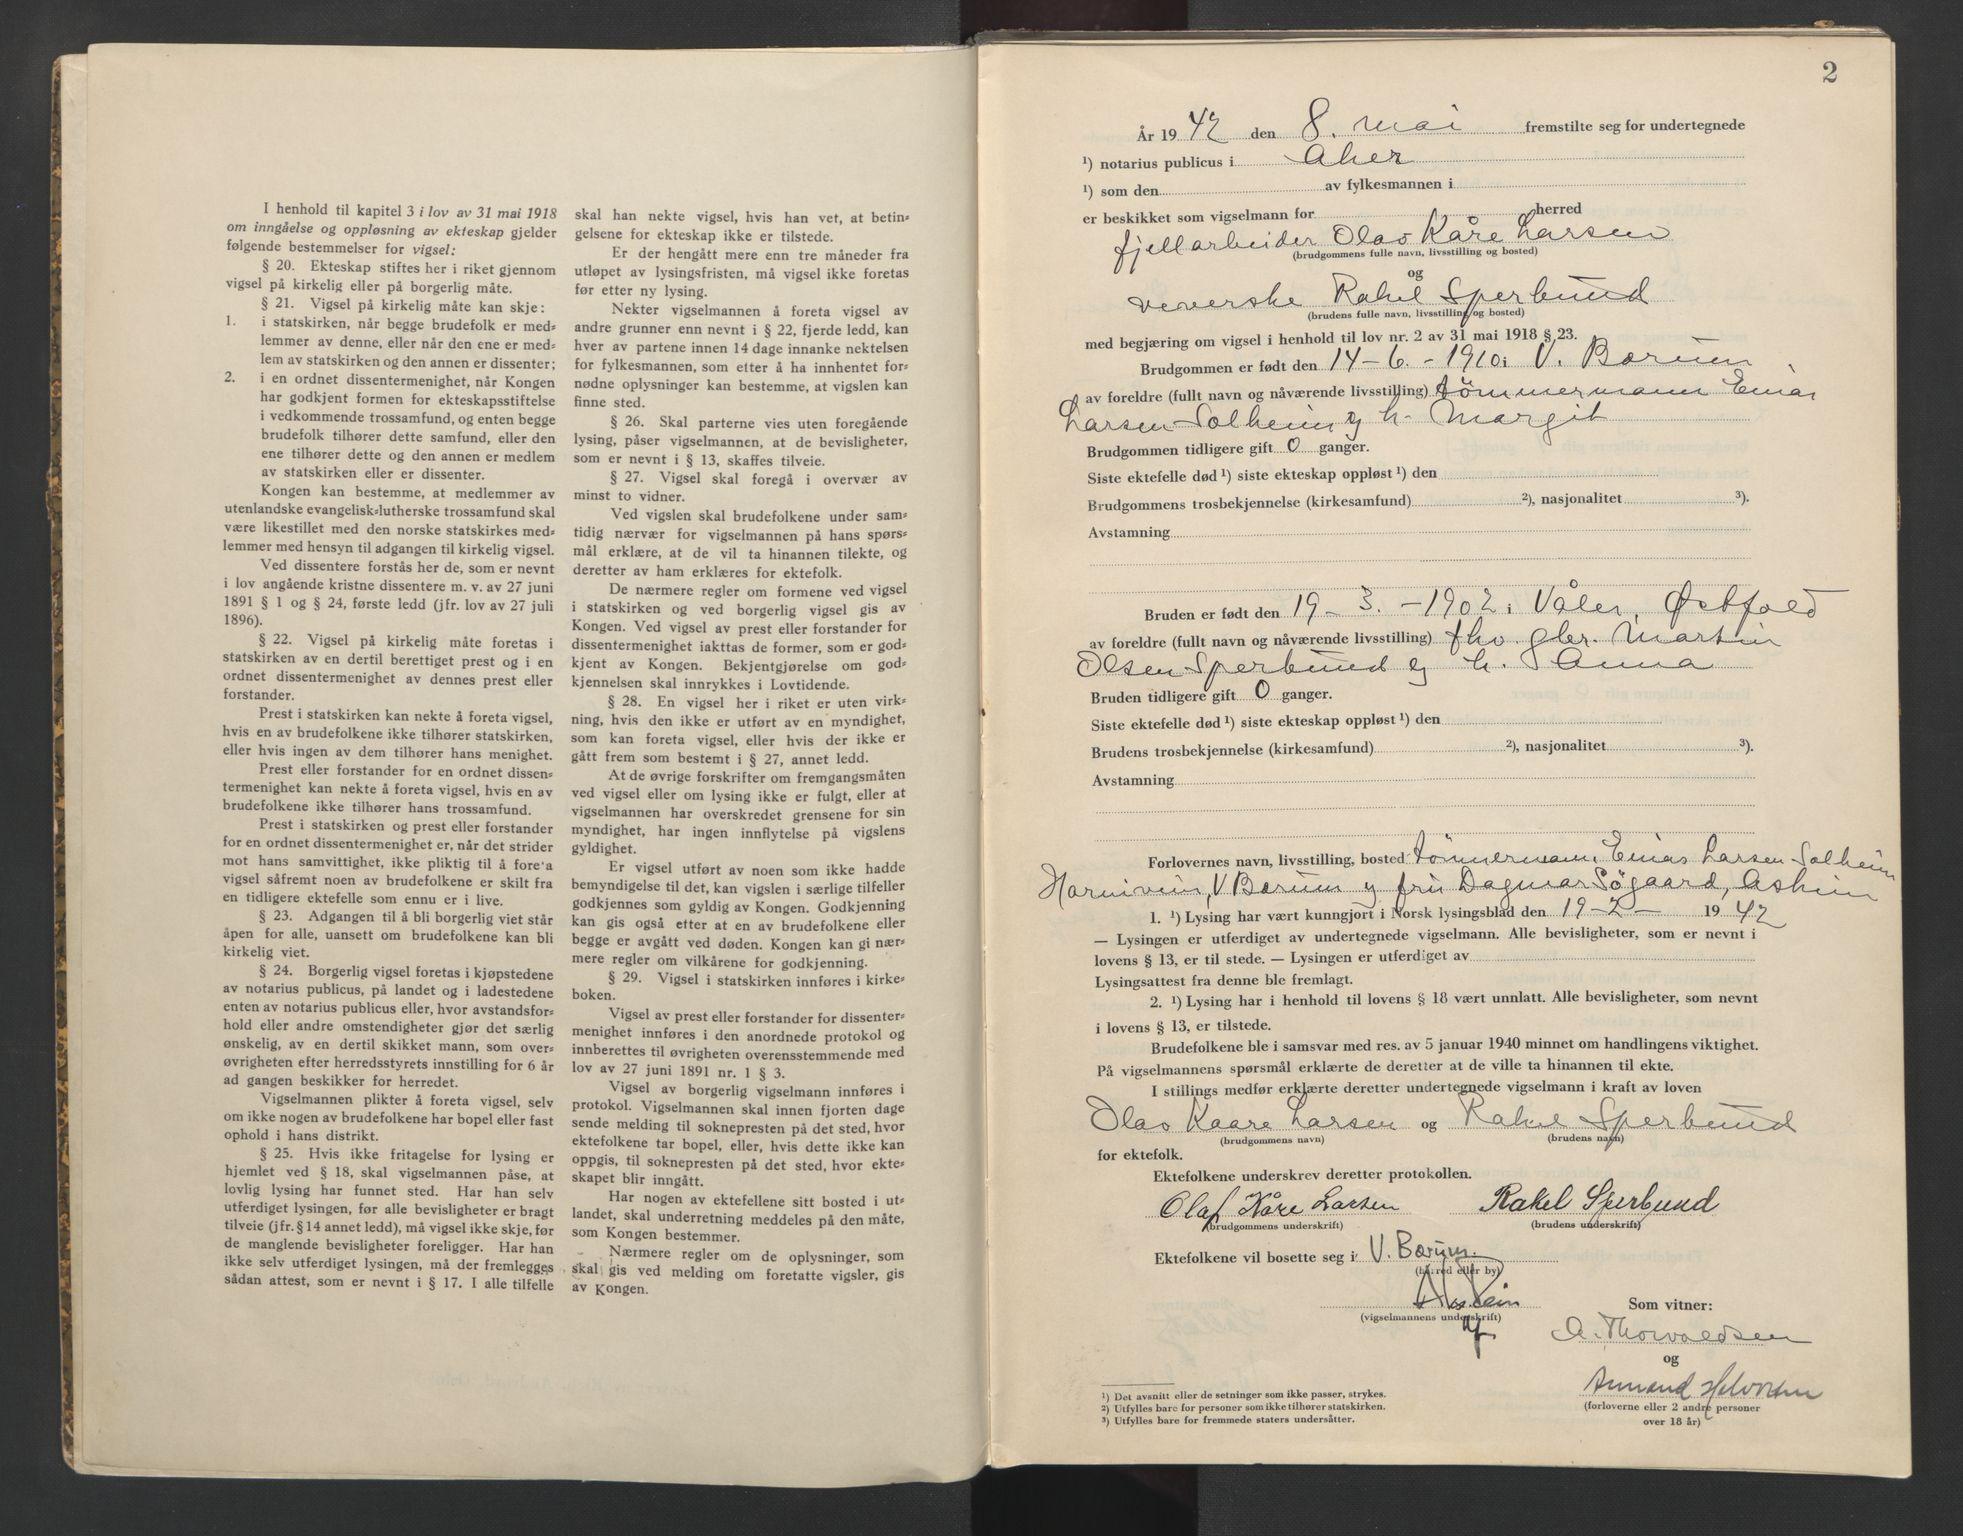 SAO, Aker sorenskriveri, L/Lc/Lcb/L0015: Vigselprotokoll, 1942, s. 2